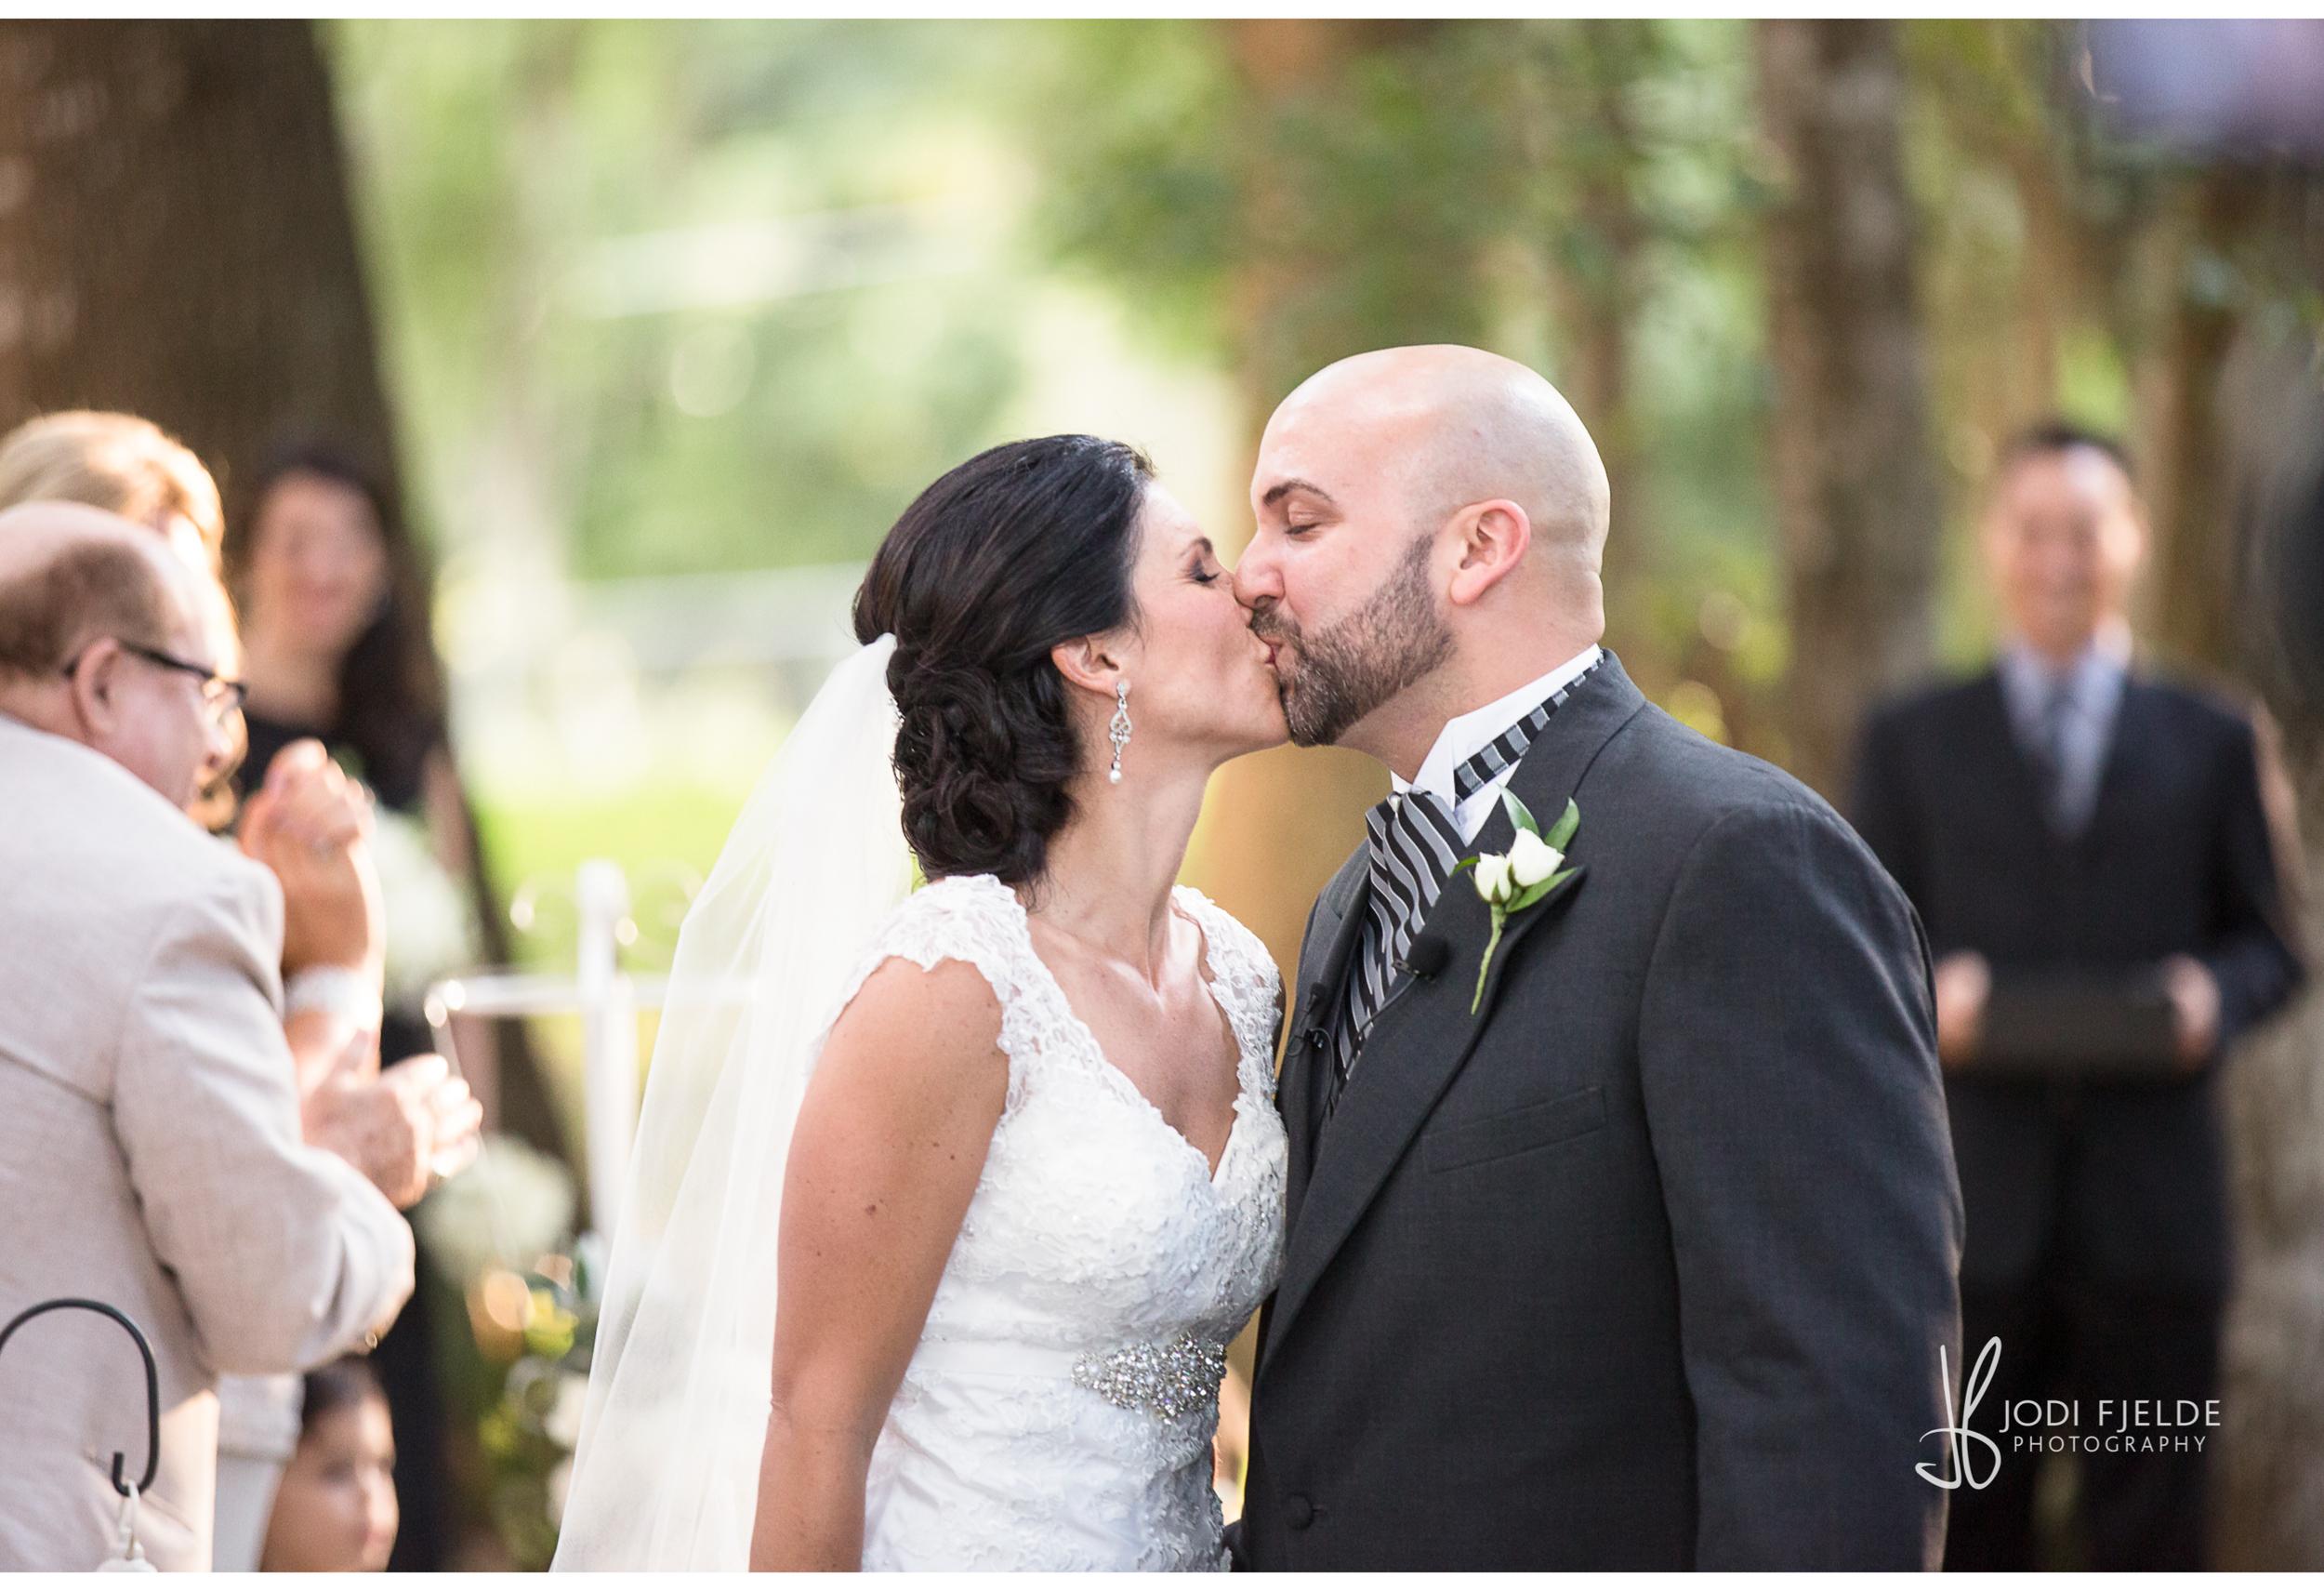 Highland_Manor_Apopka_Florida_wedding_Jackie_&_Tim_photography_jodi_Fjelde_photography-0.jpg